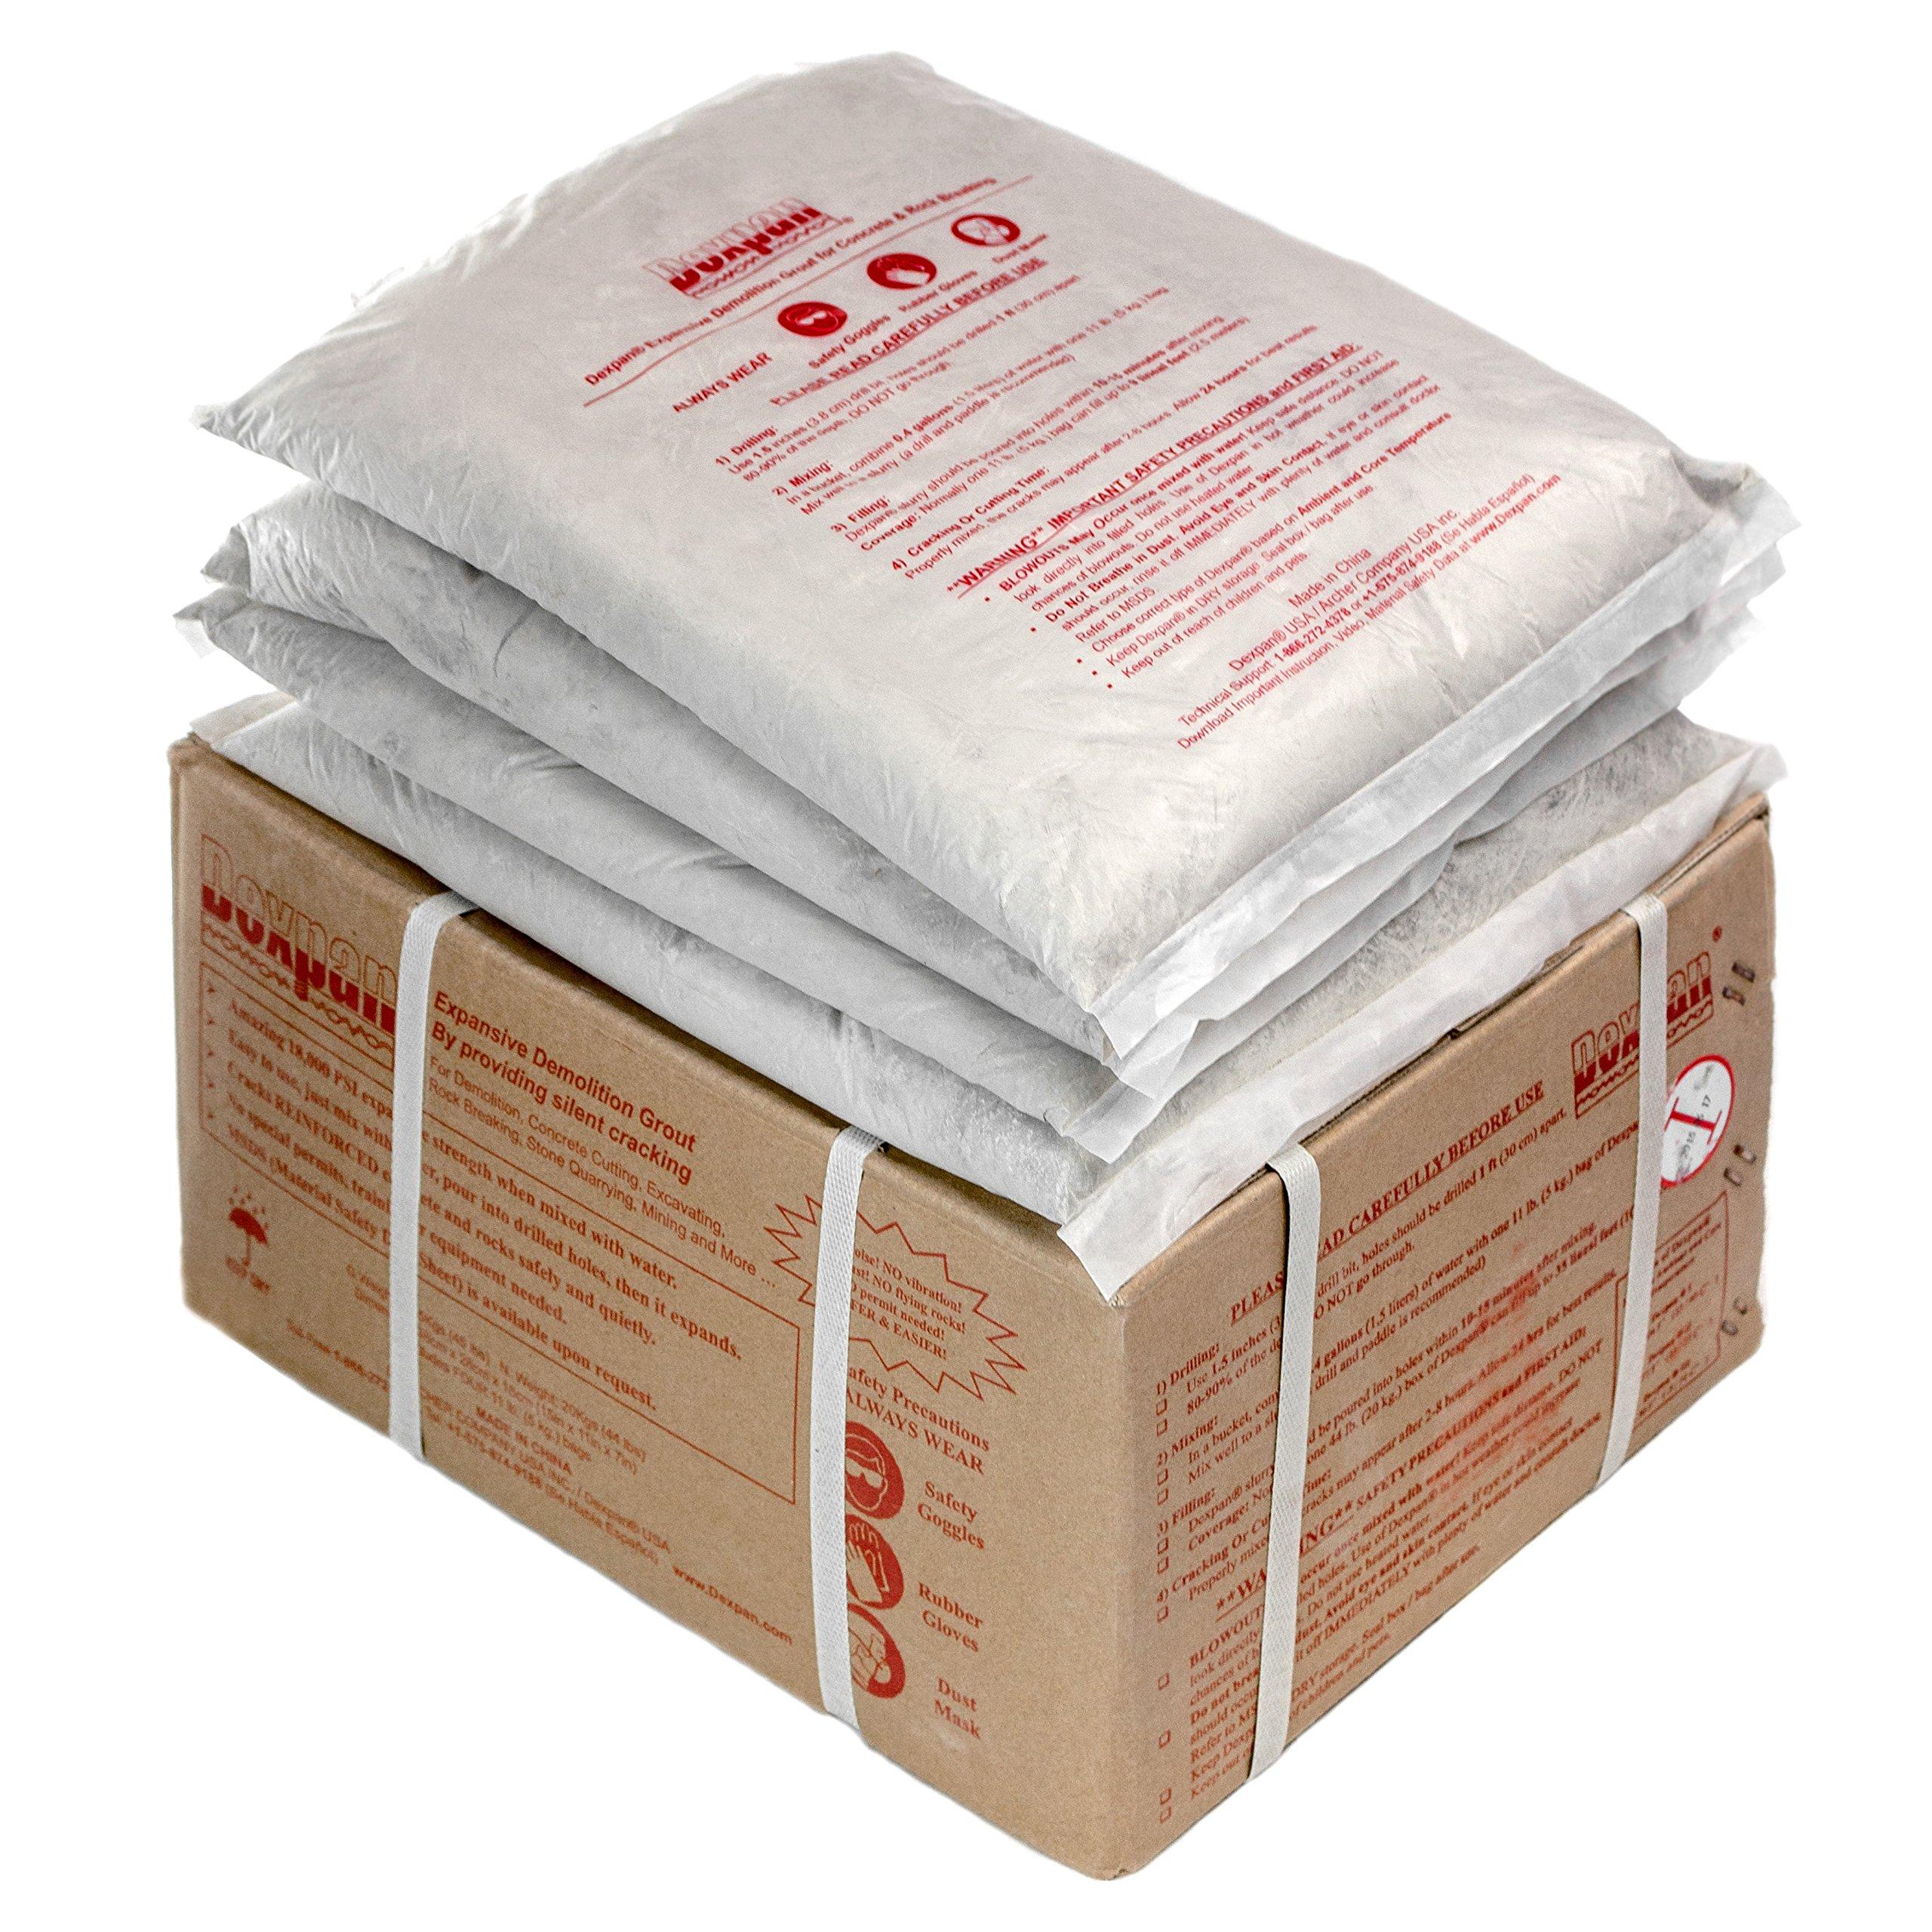 Dexpan Non-Explosive Demolition Agent 44 Lb. Box for Rock Breaking, Concrete Cutting, Excavating, Quarrying and Mining. Alternative to Blasting, Demolition Jack Hammer Breaker, Jackhammer, Diamond Blade Concrete Saw, Rock Drill (#1 (77F-104F))